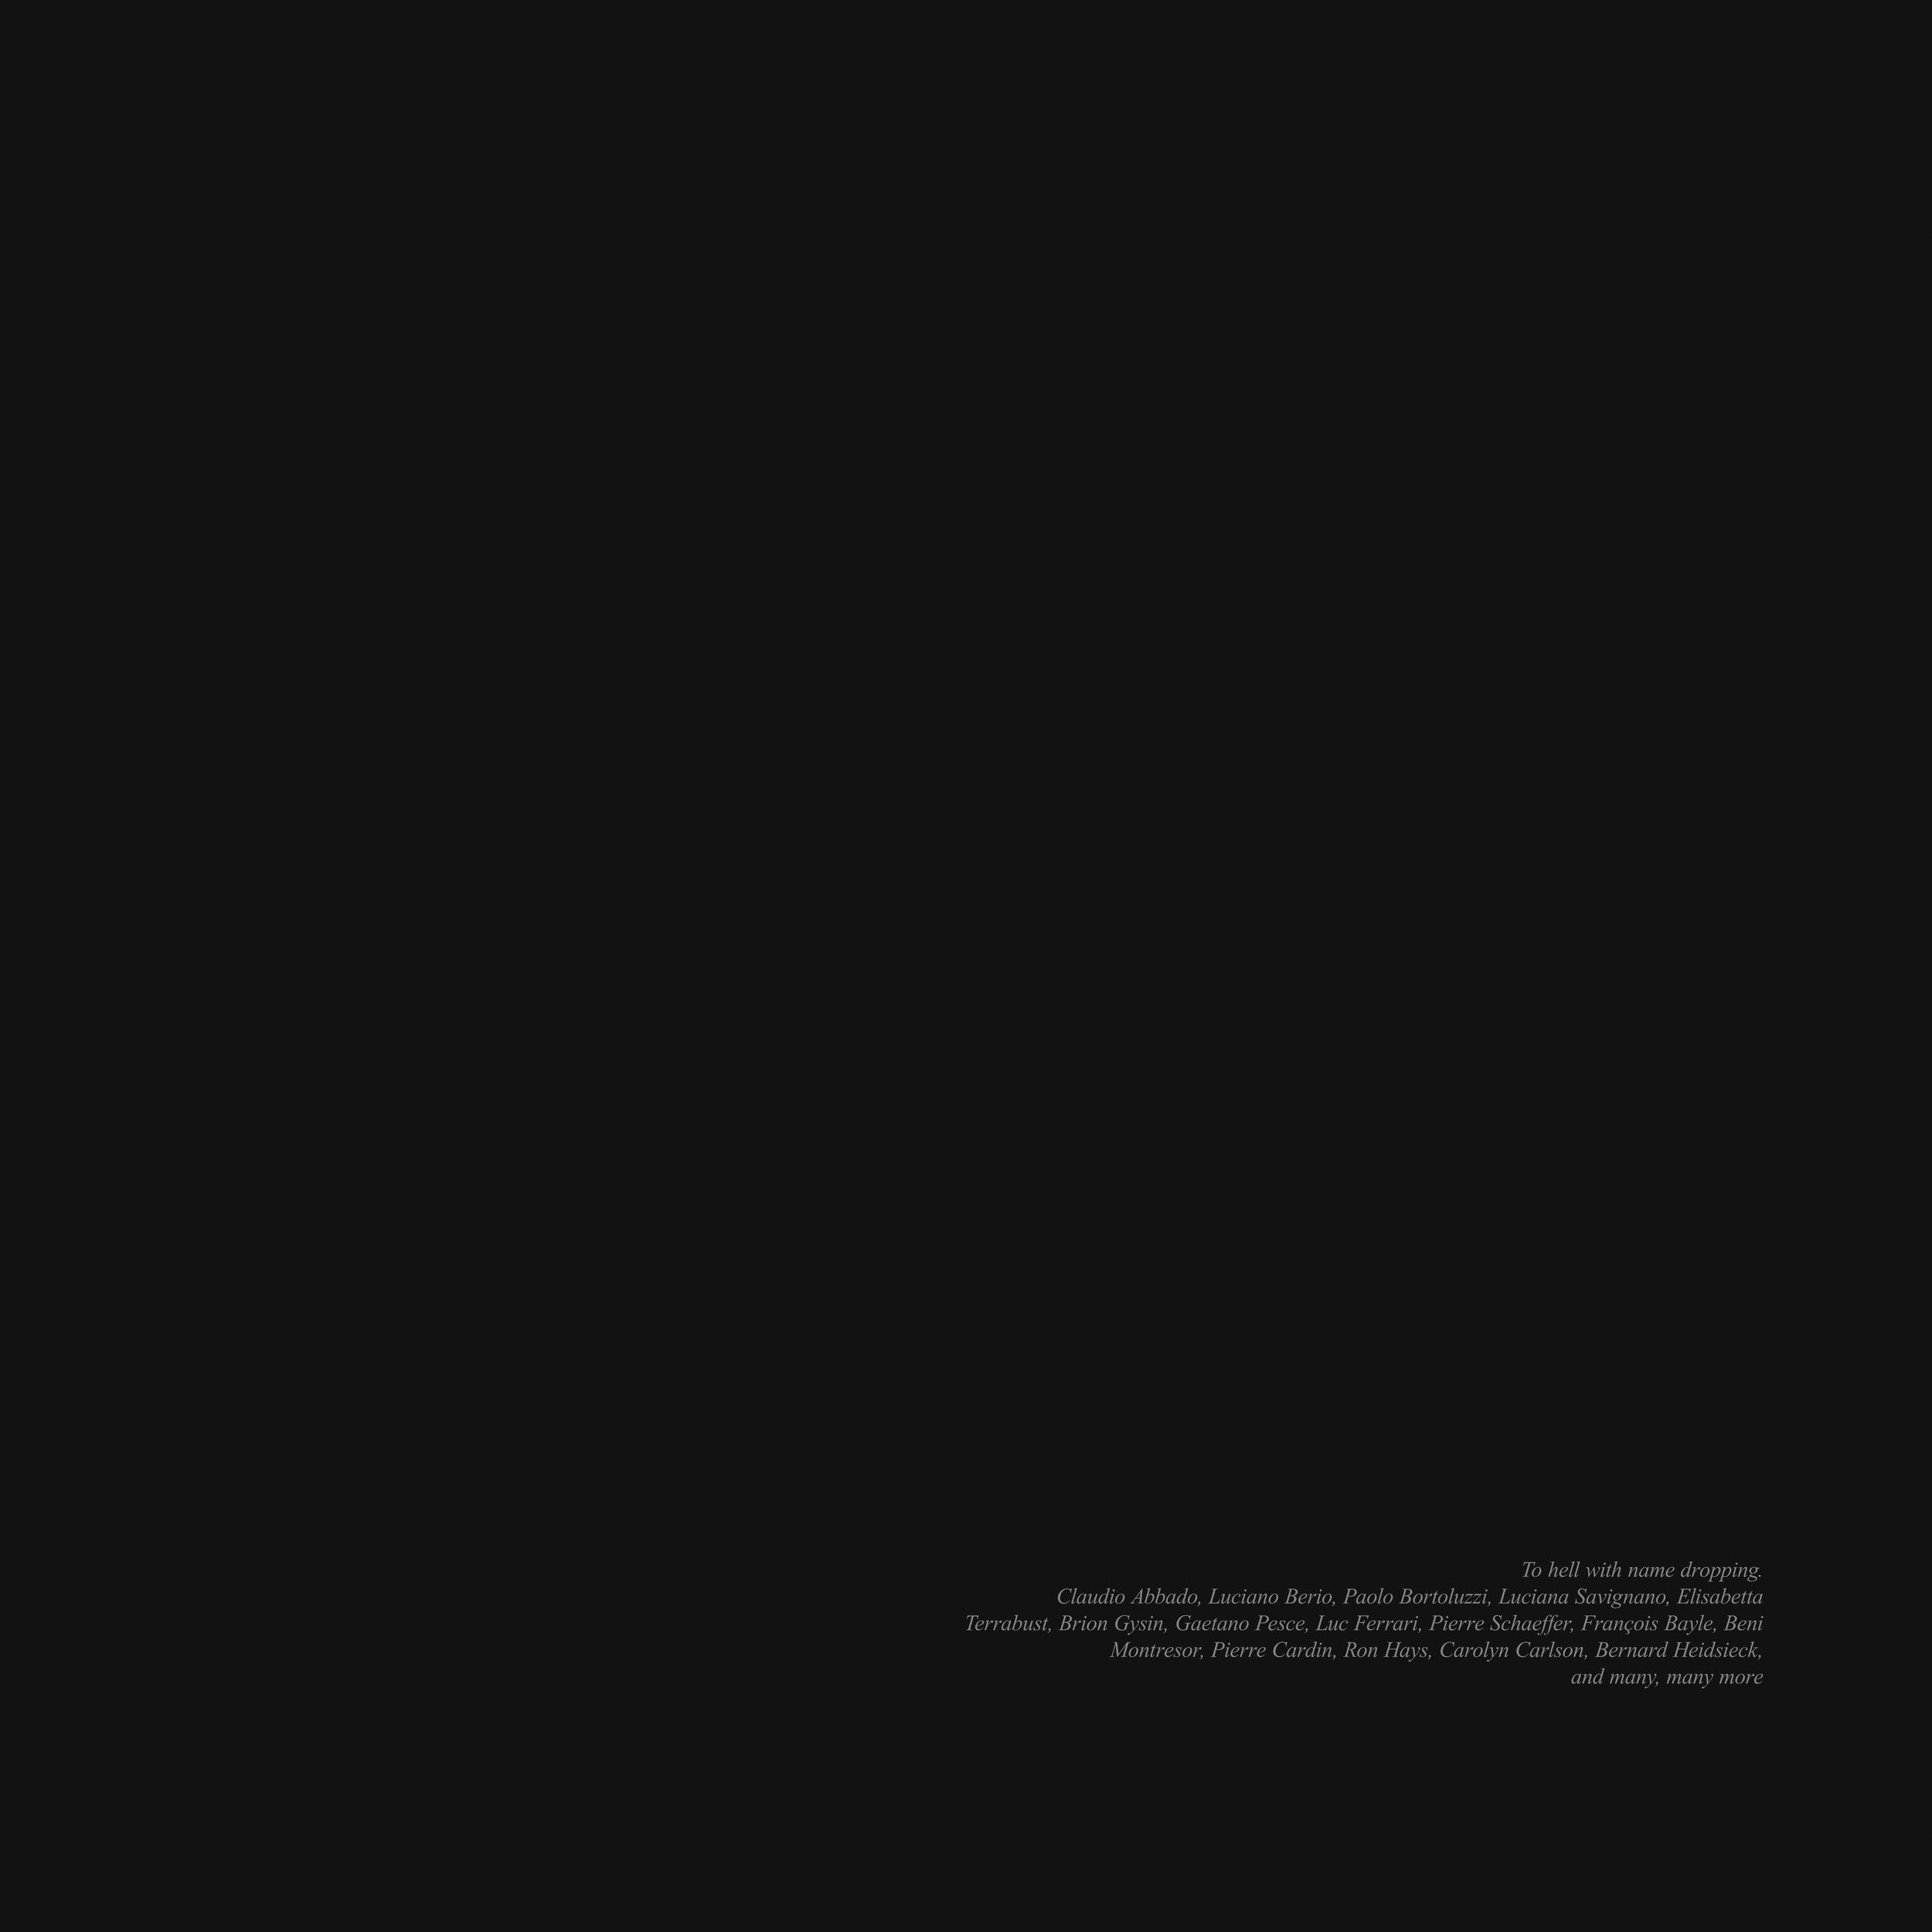 Ragnar_Grippe - Symphonic_Songs - DIAS126 - inner sleeve B.jpg